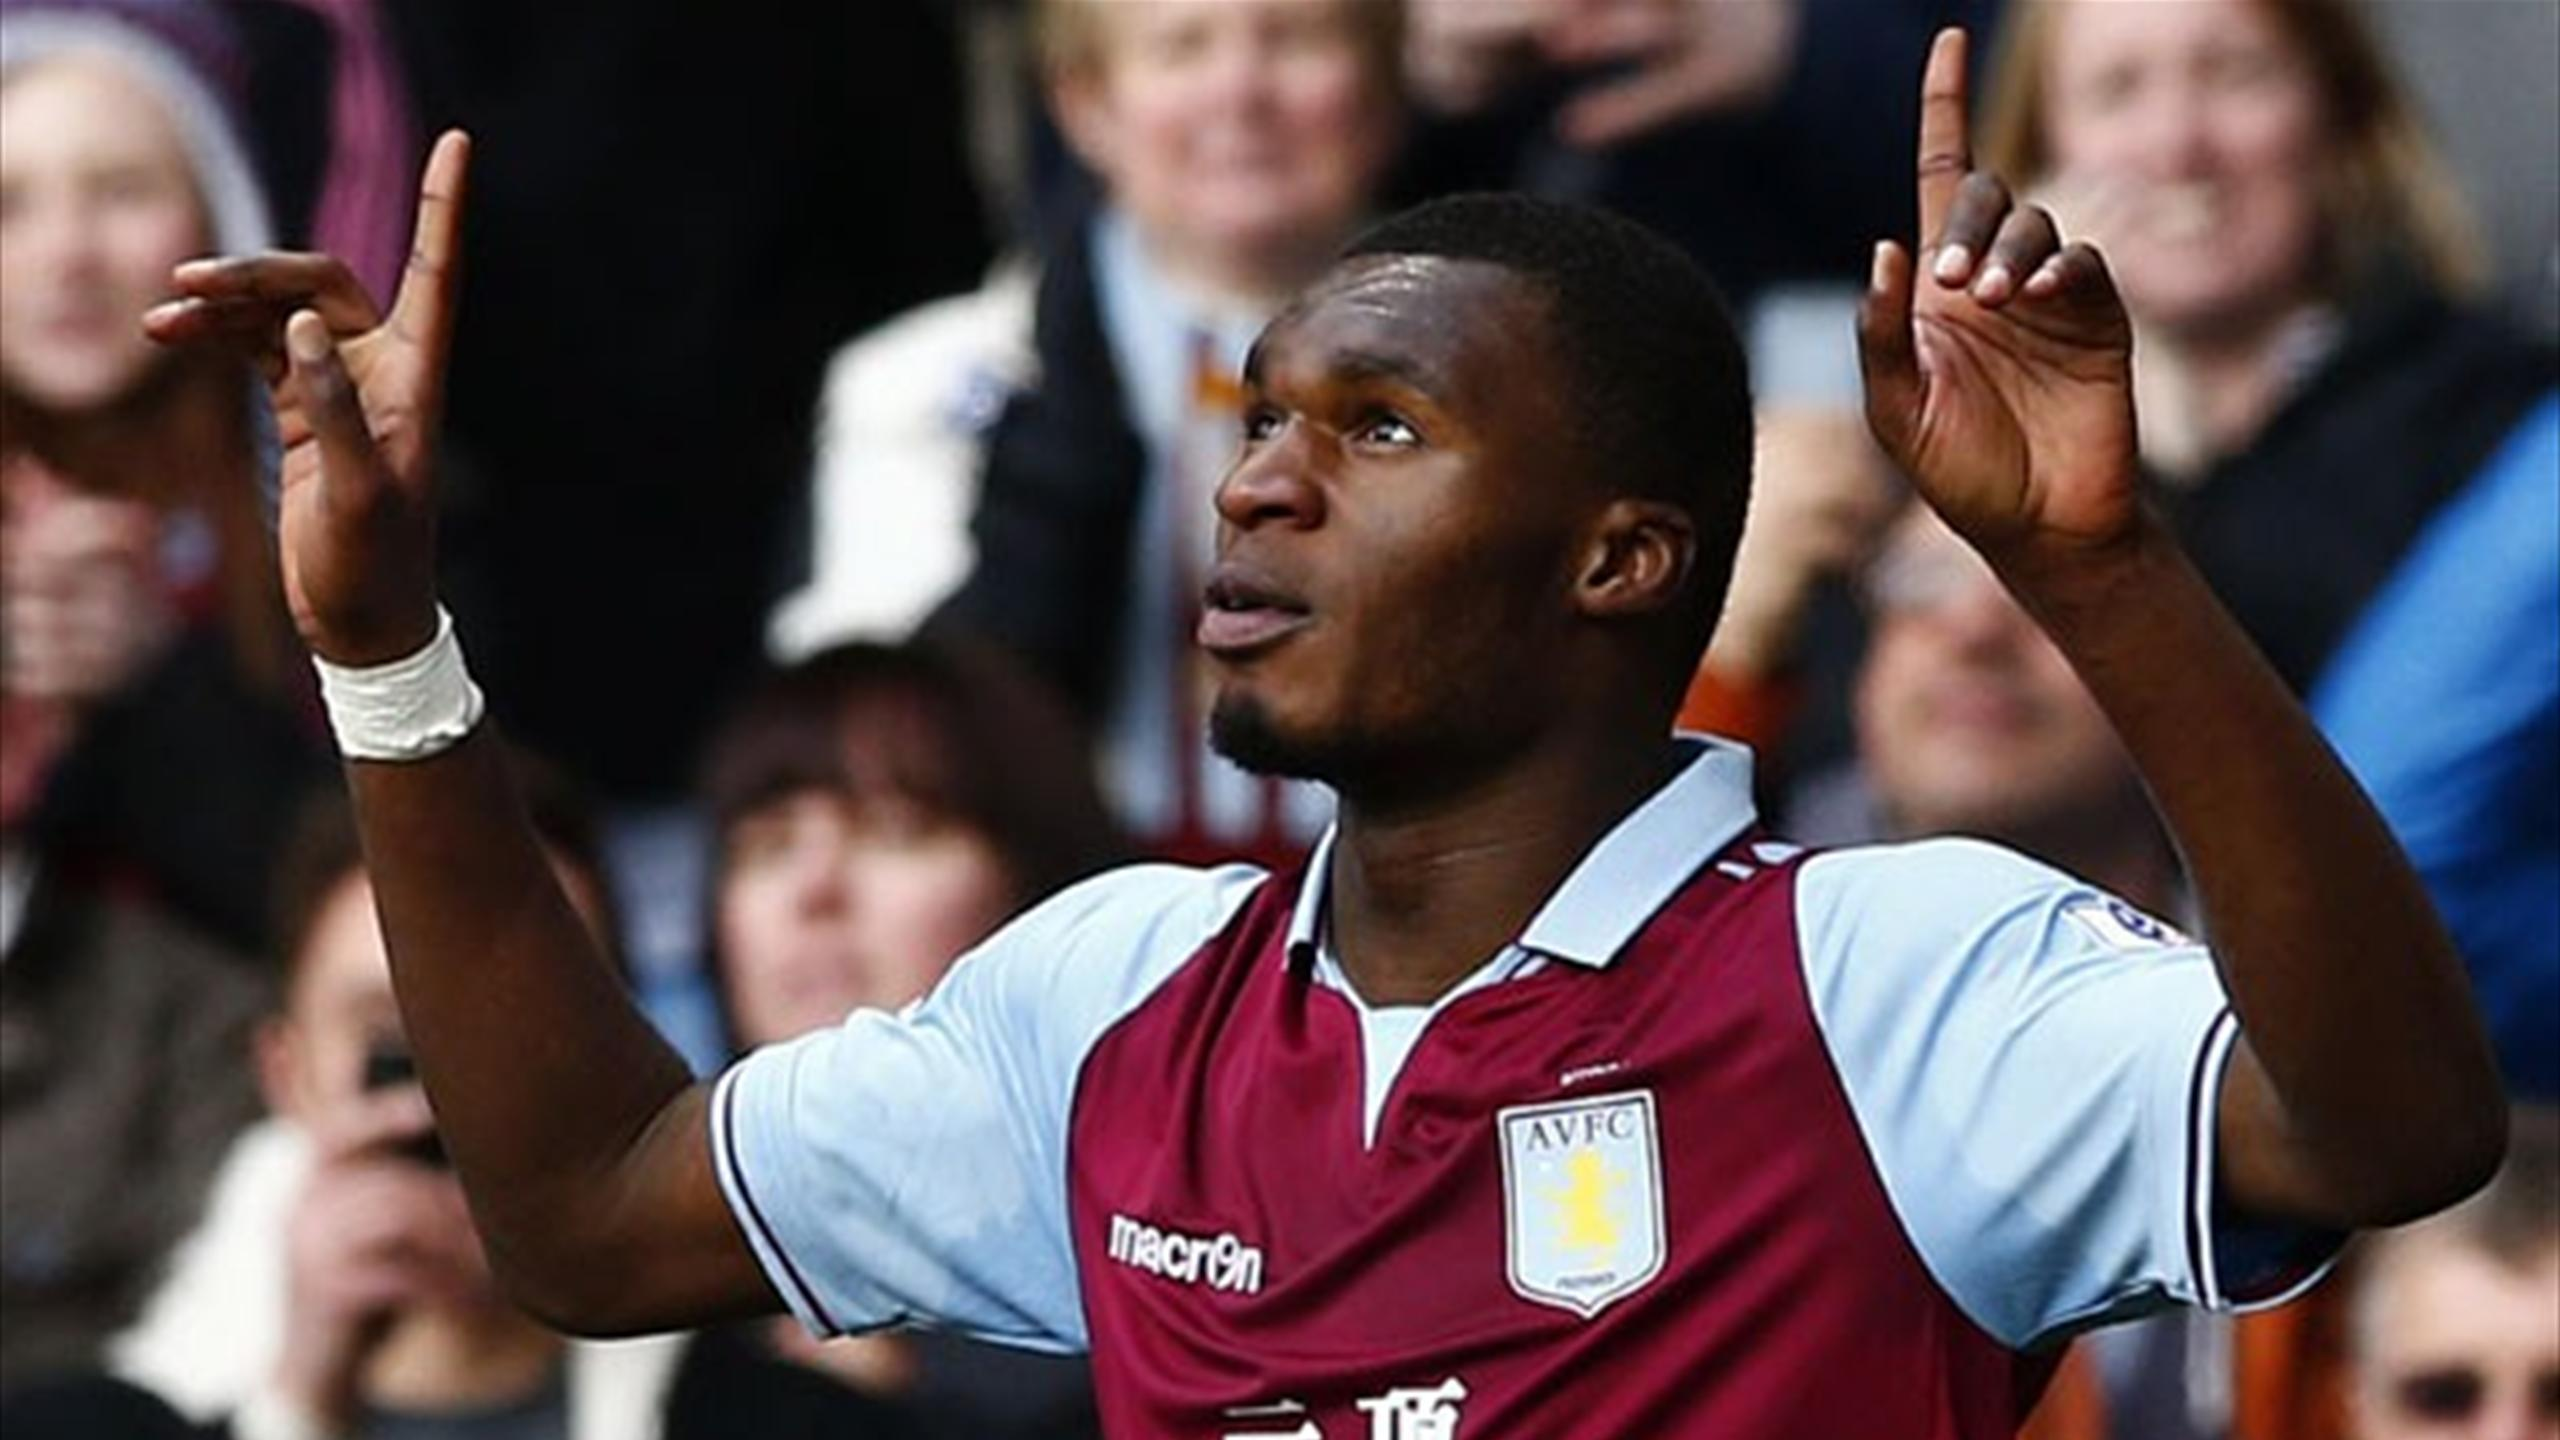 Video: Crystal Palace vs Aston Villa